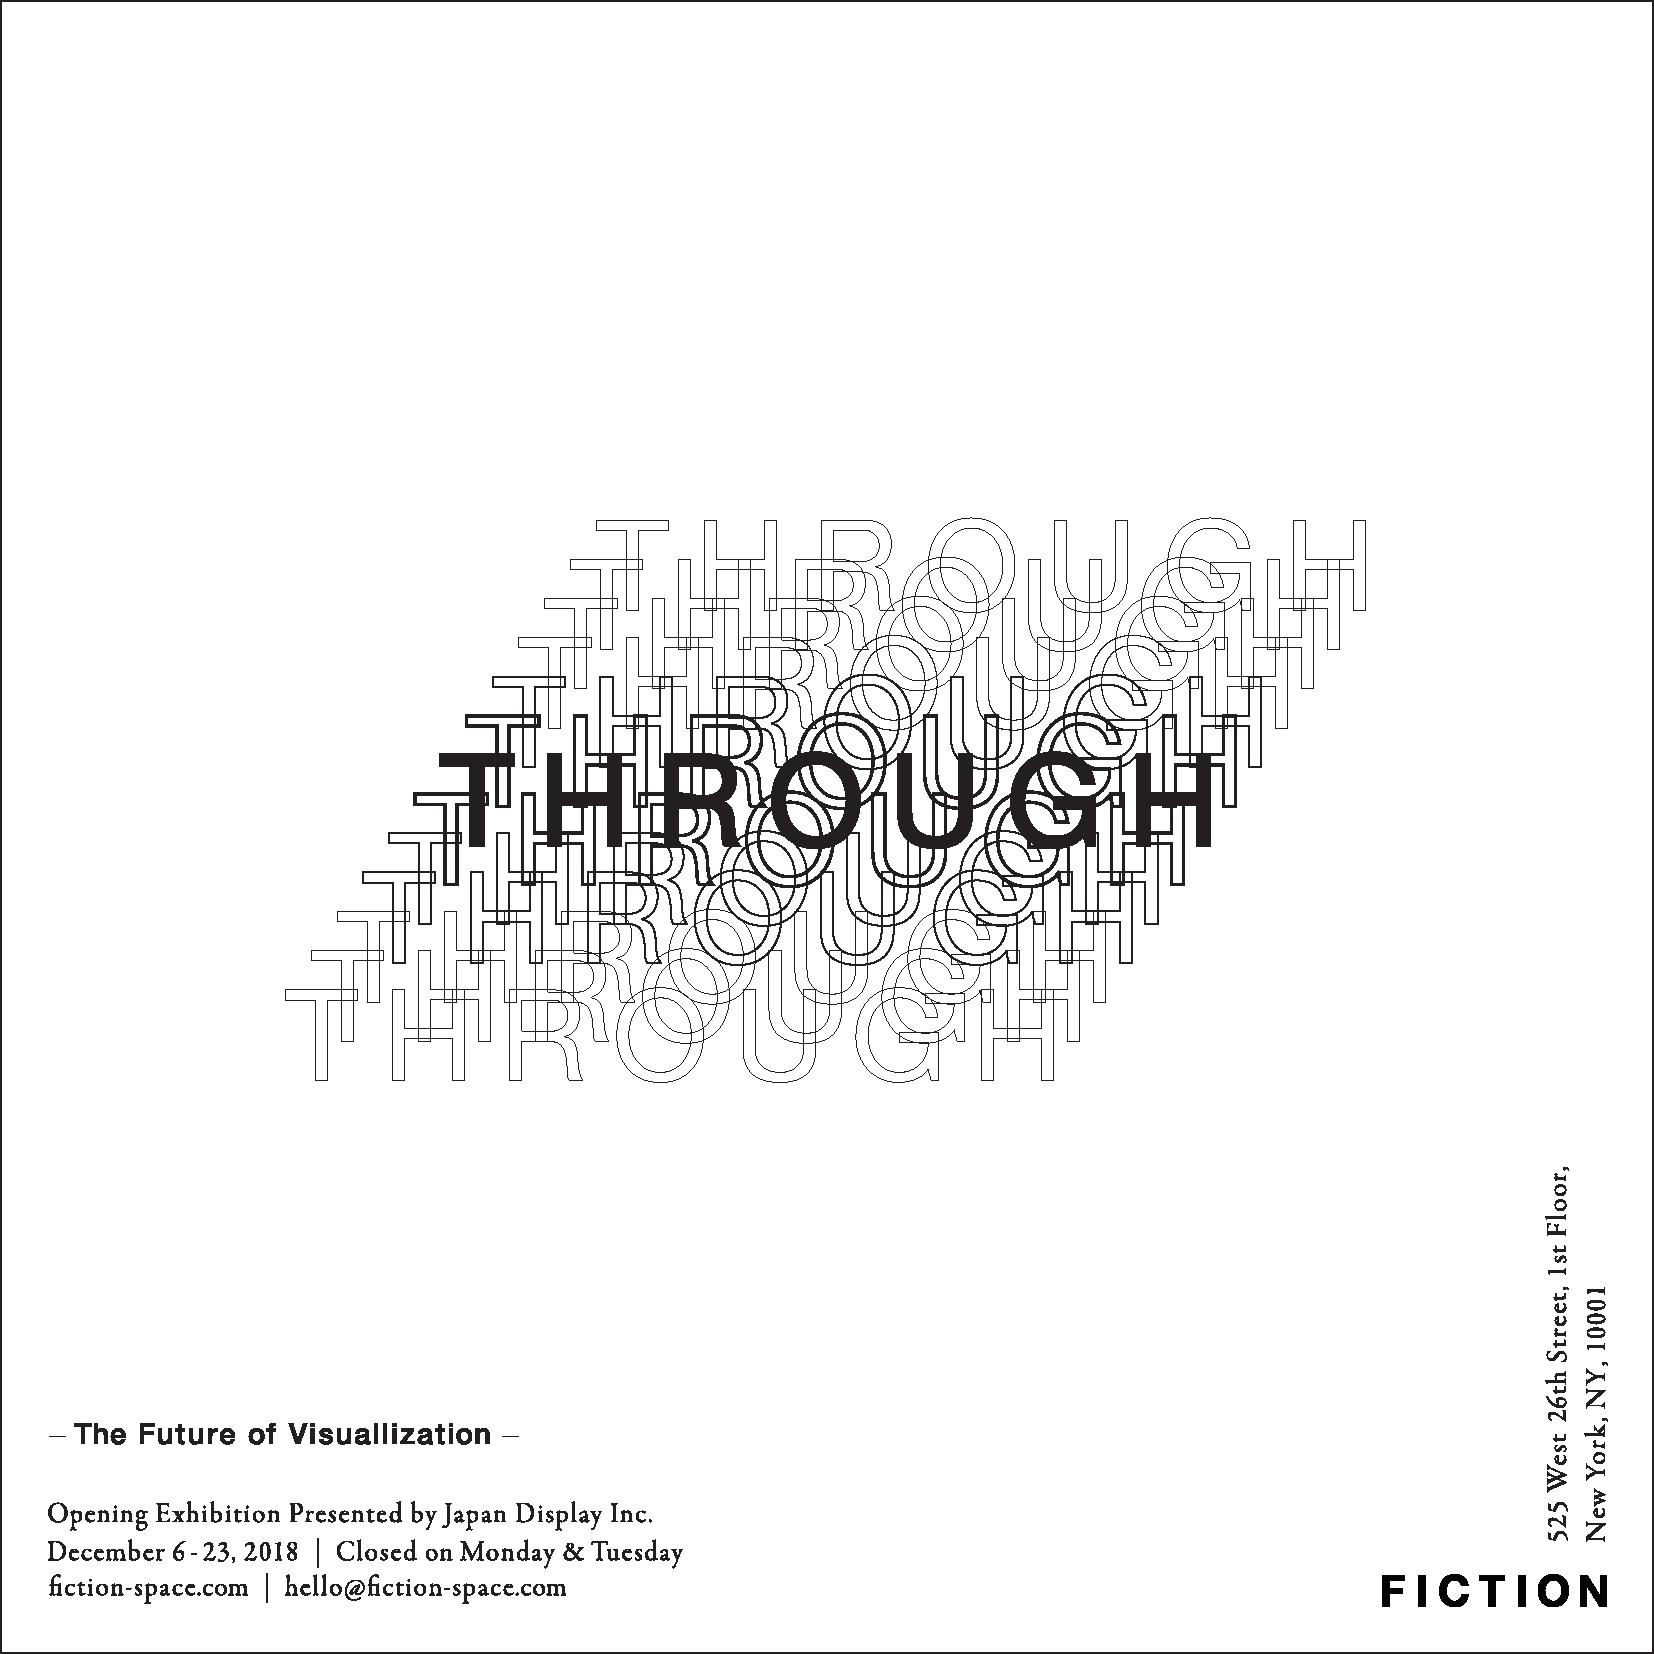 FICTION_THROUGH_.png